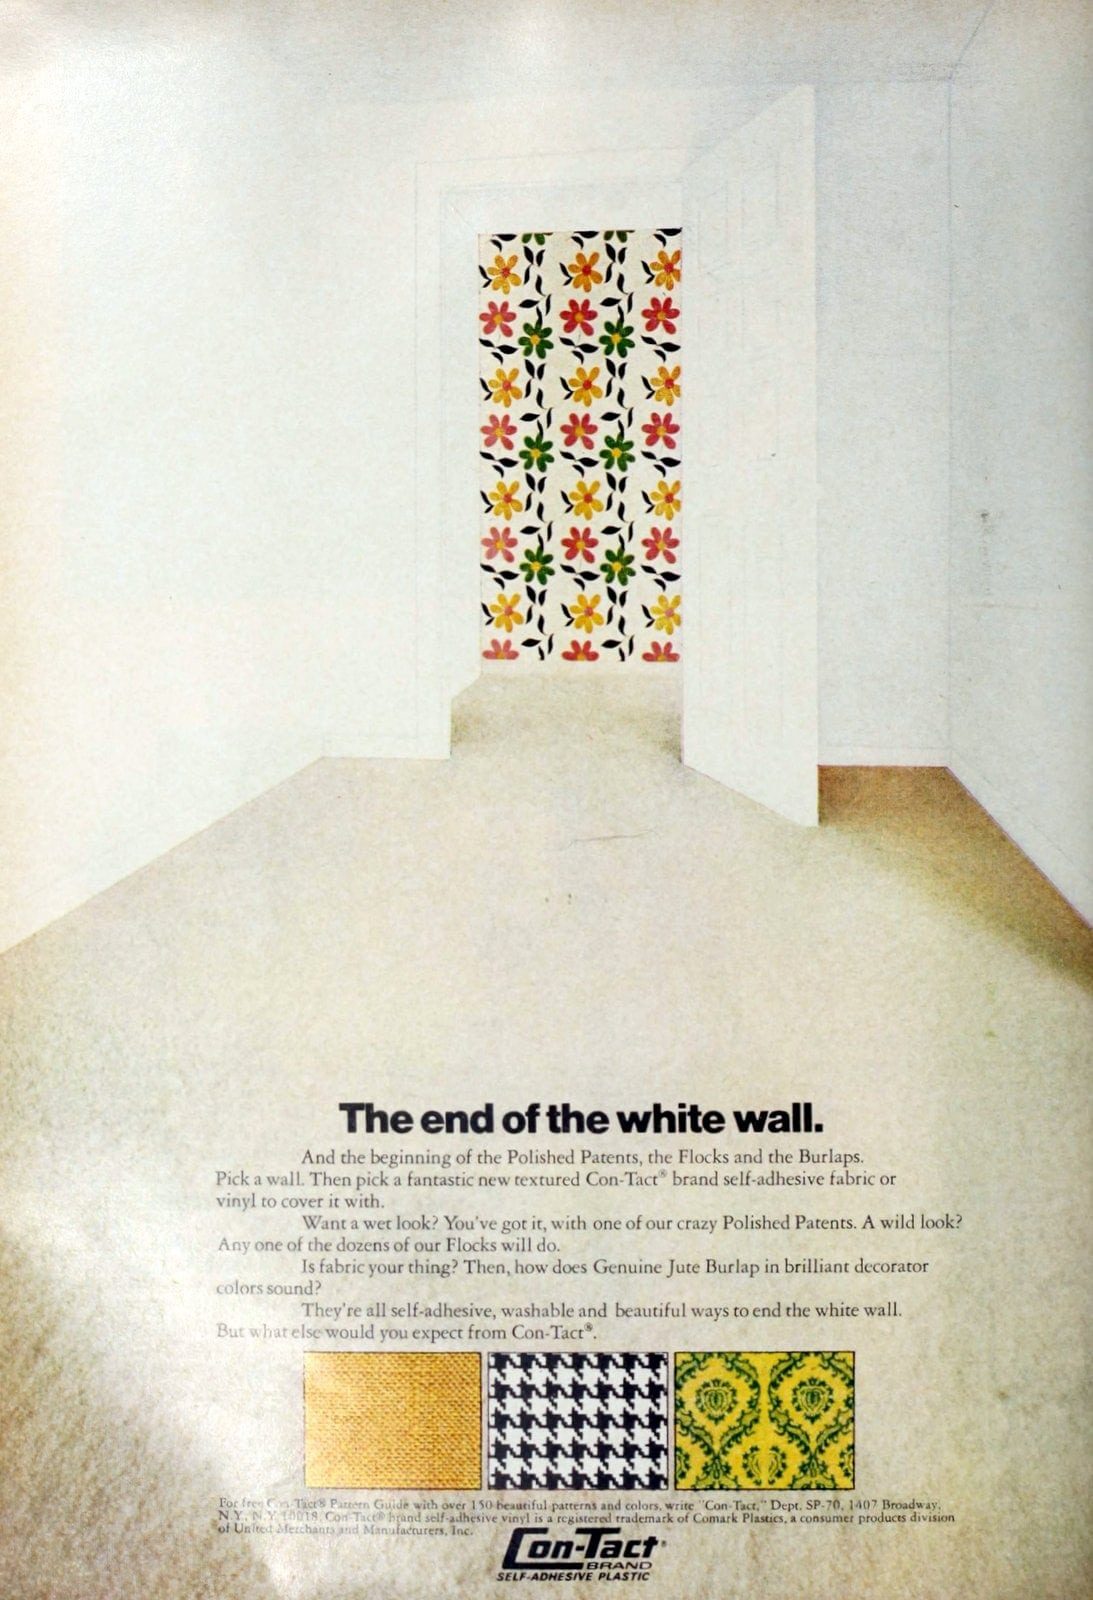 Vintage 1970s Con-Tact vinyl wall decor